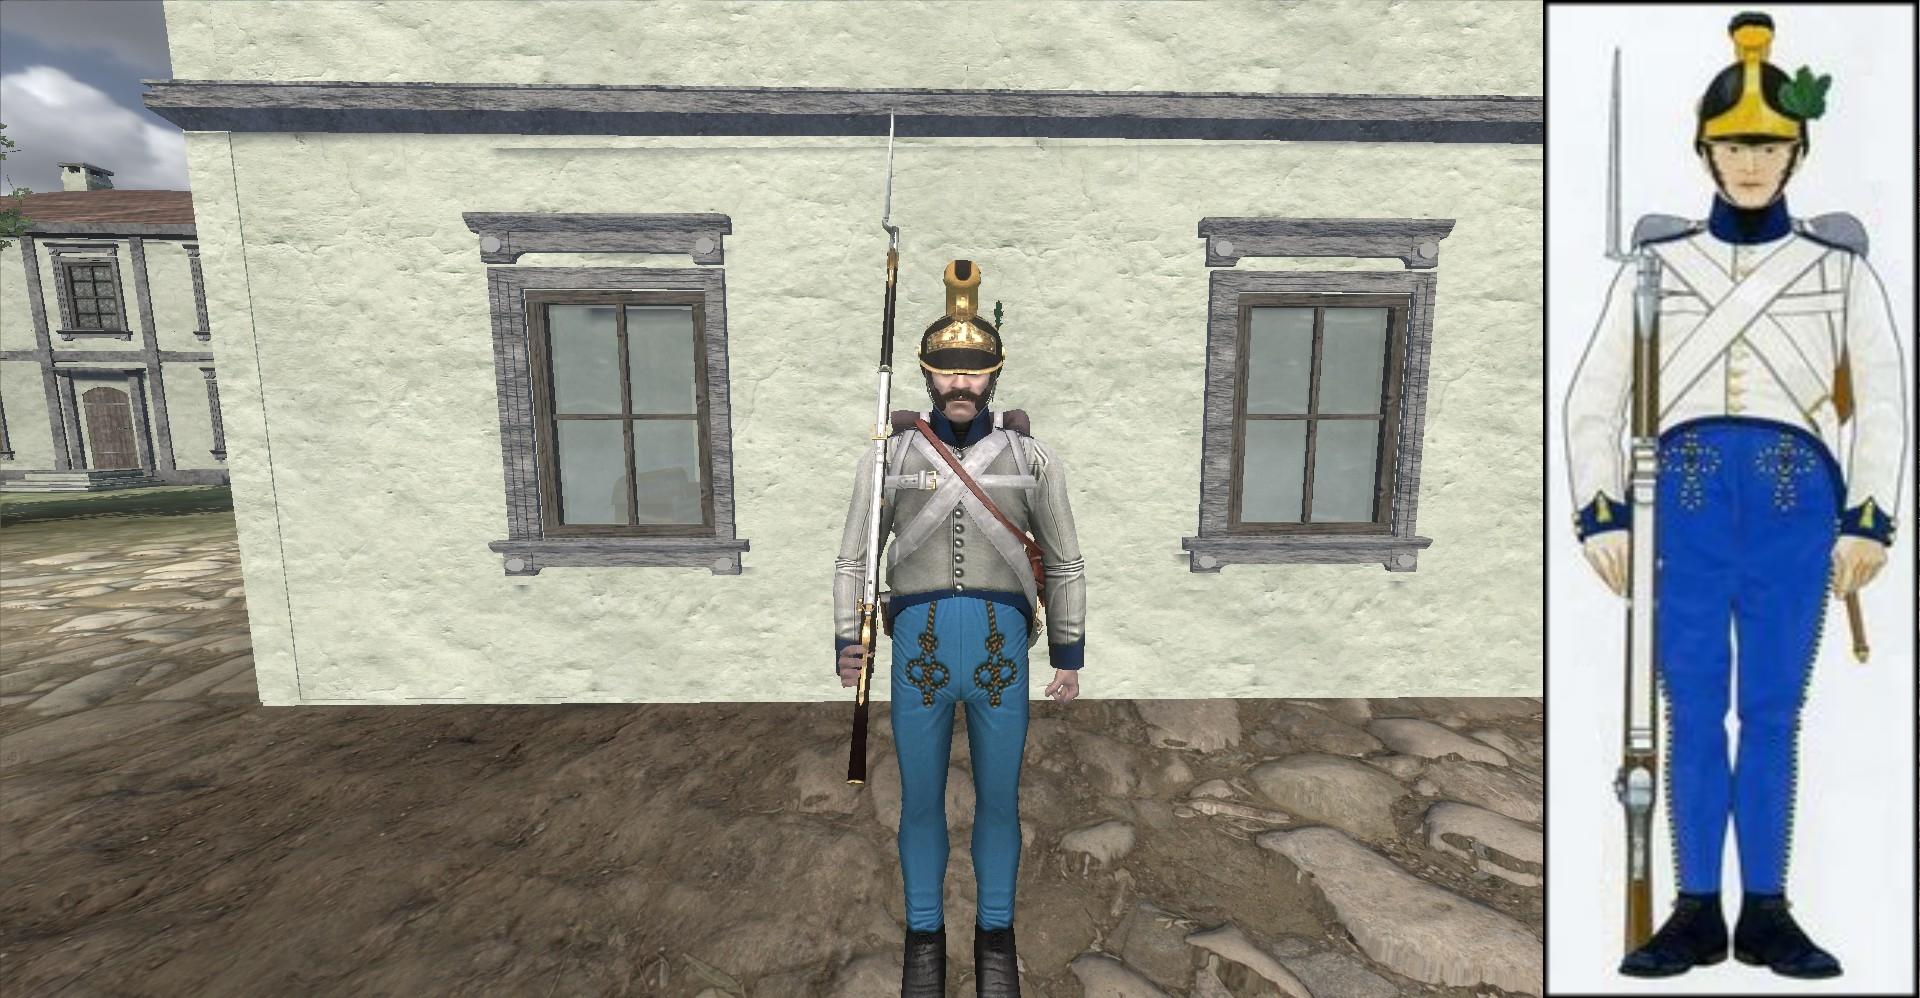 Infantrie Regiment Spenyi Brigade Nr. 6